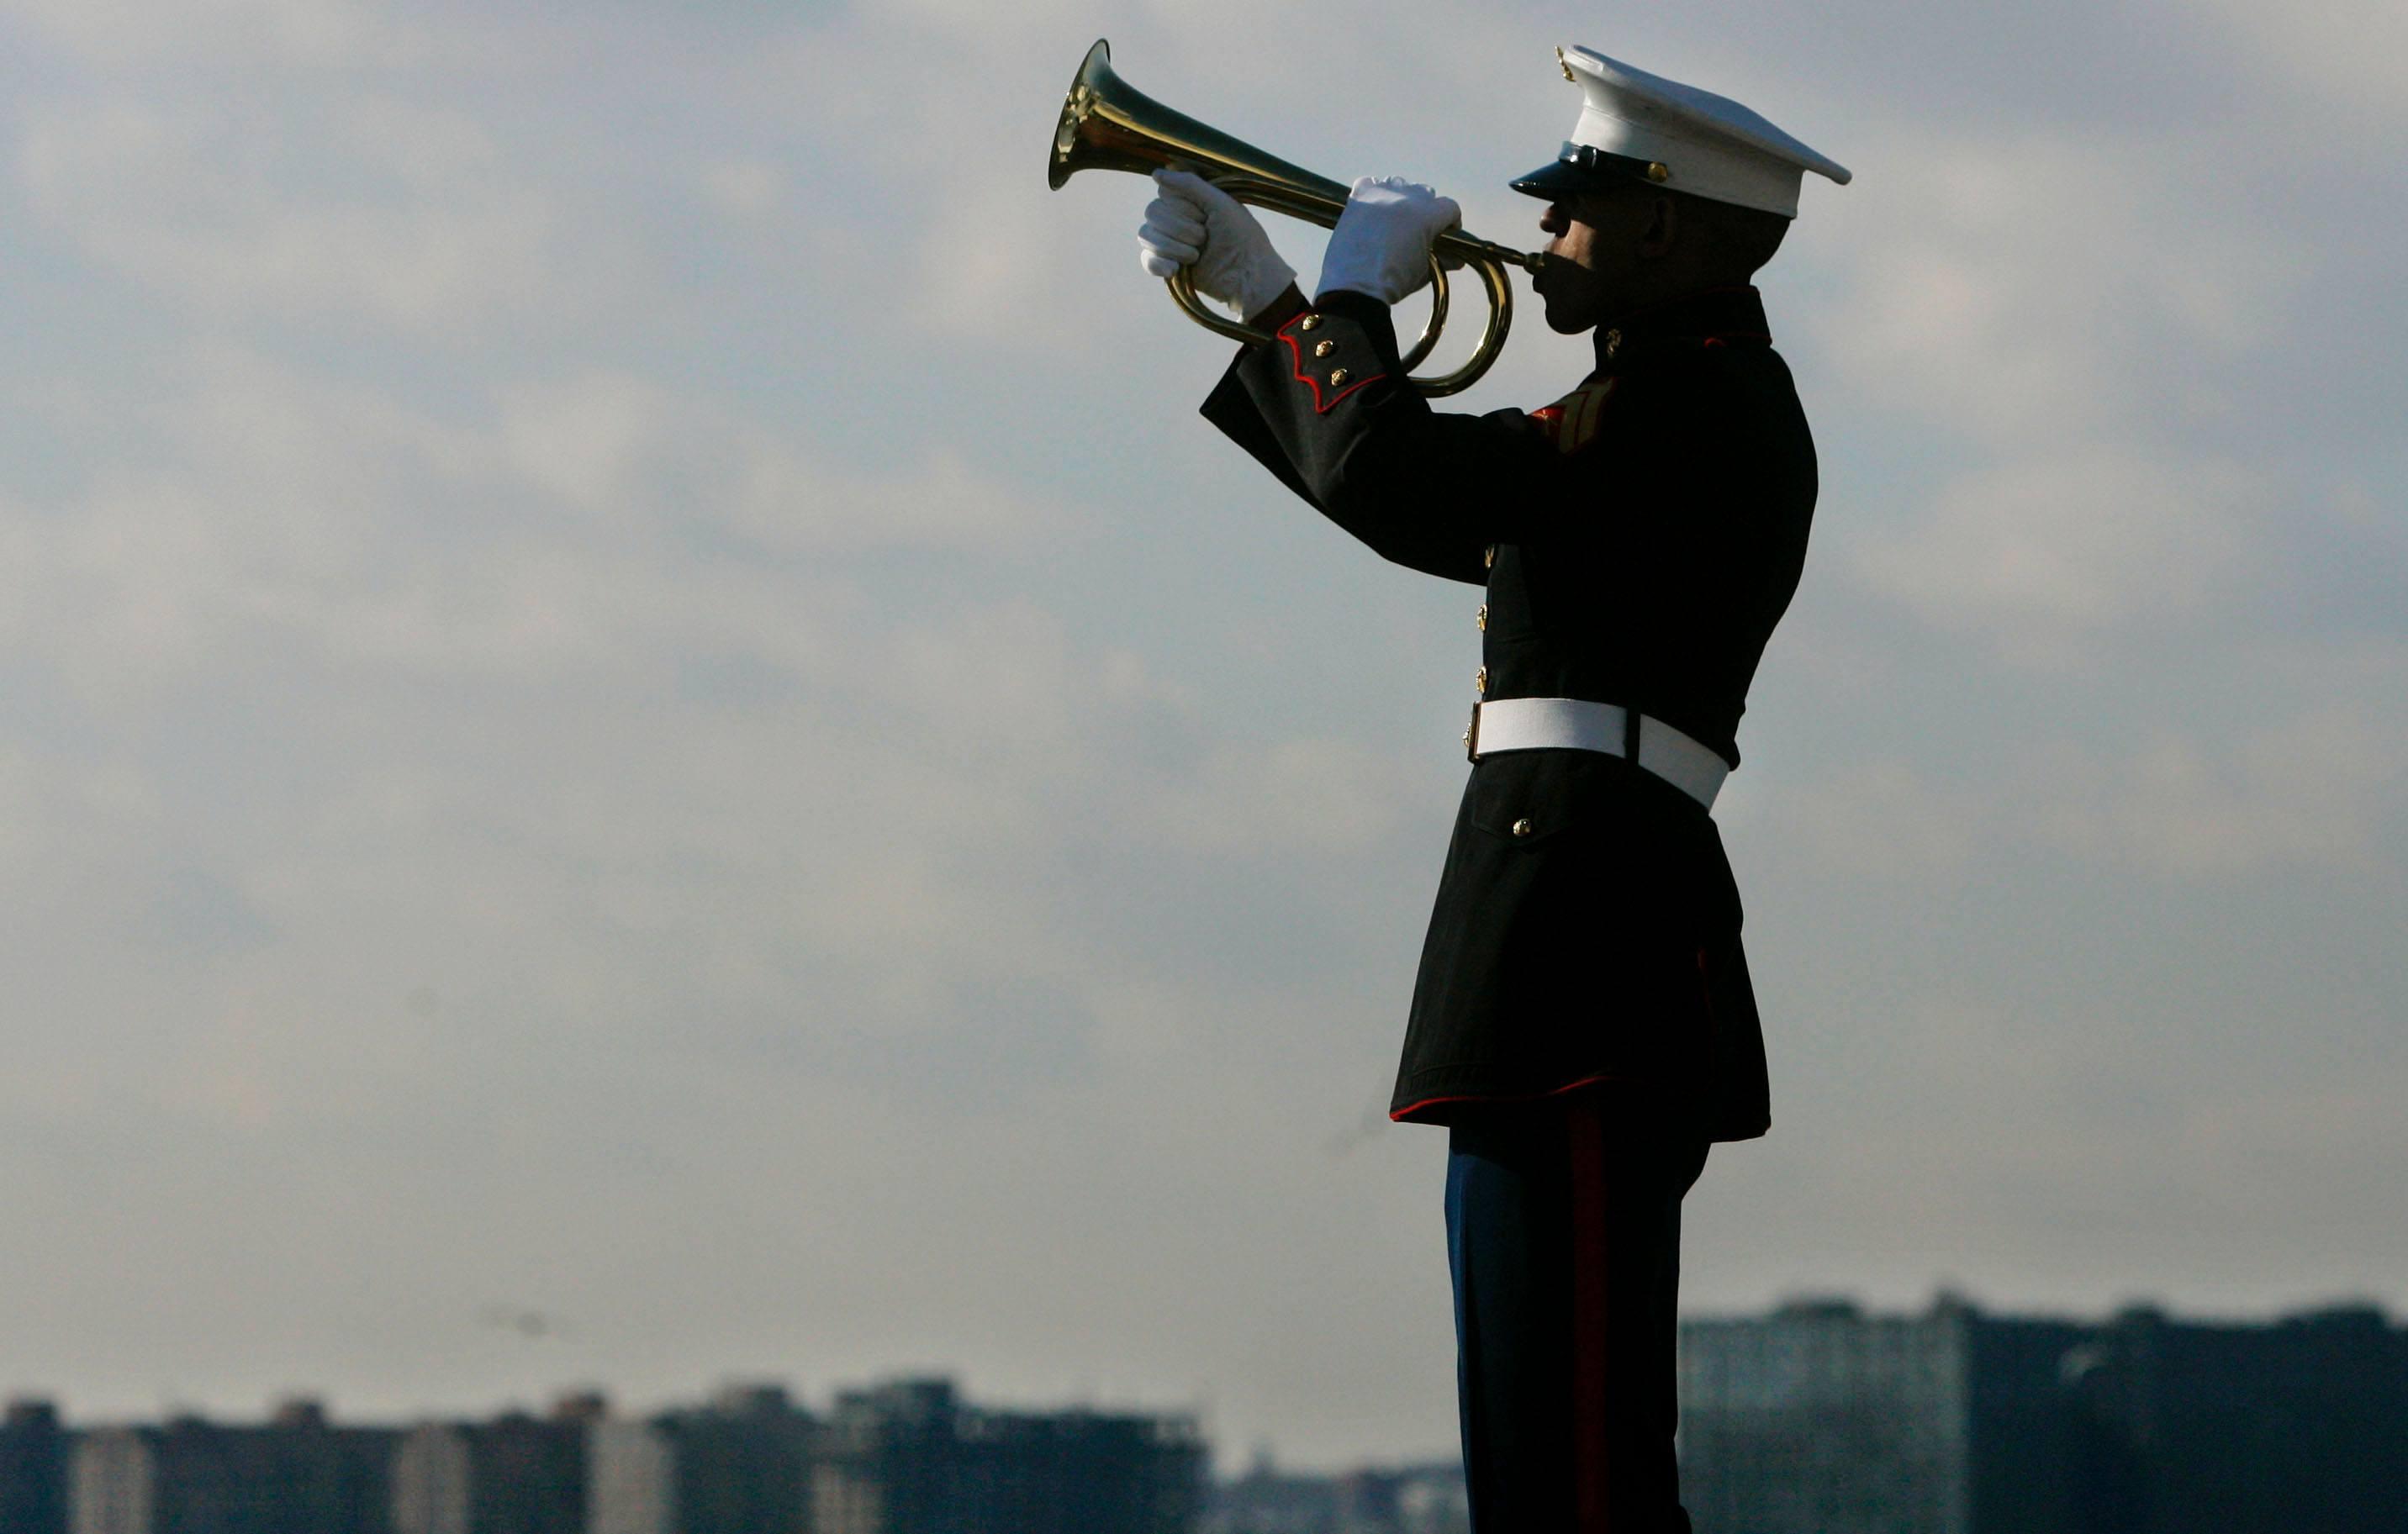 A U.S. Marine Corps bugler plays taps